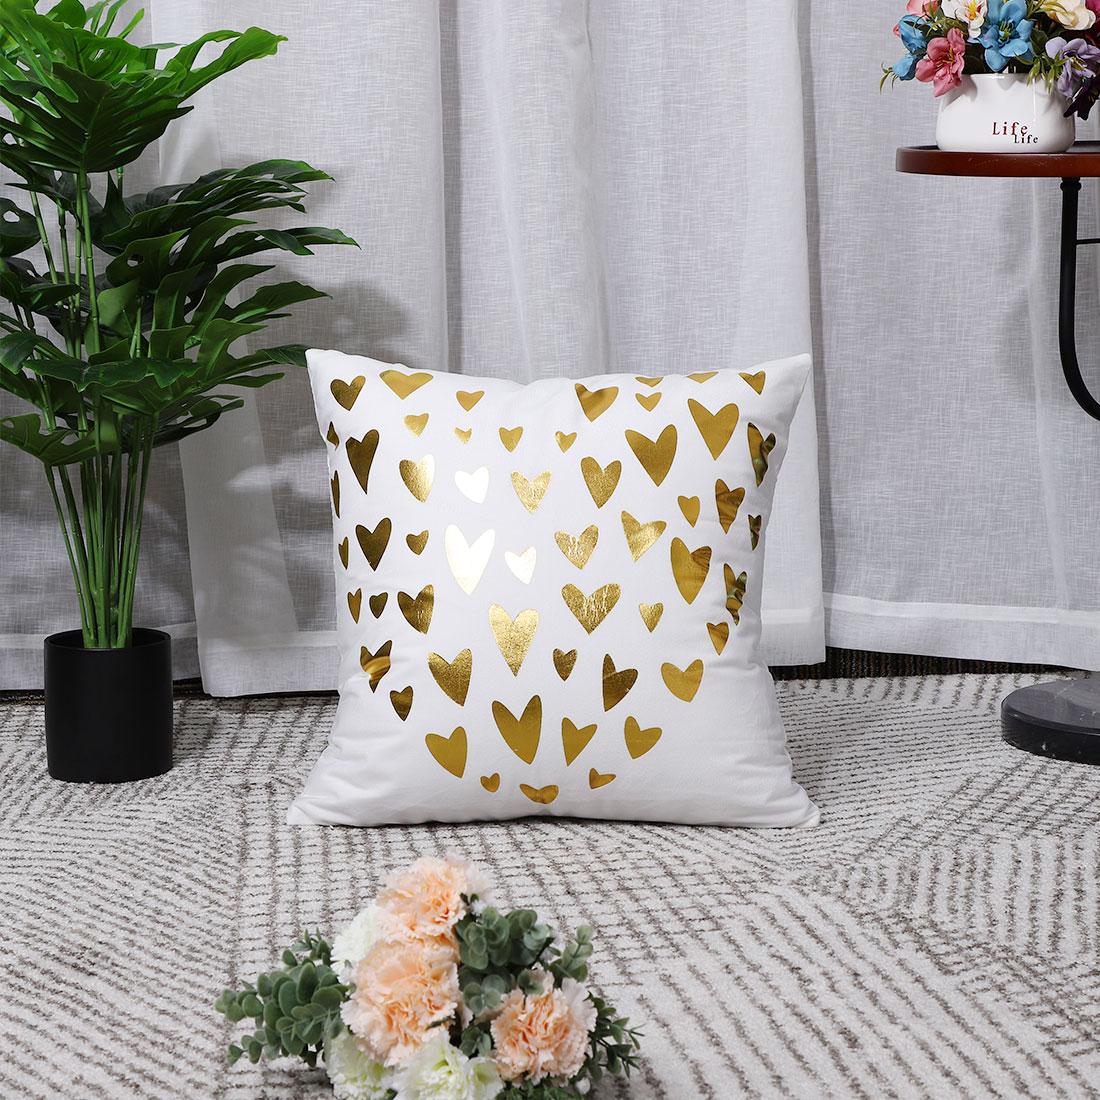 Decoration-Pillow-Covers-Cotton-Linen-Throw-Pillow-Case-Cushion-Cover thumbnail 47